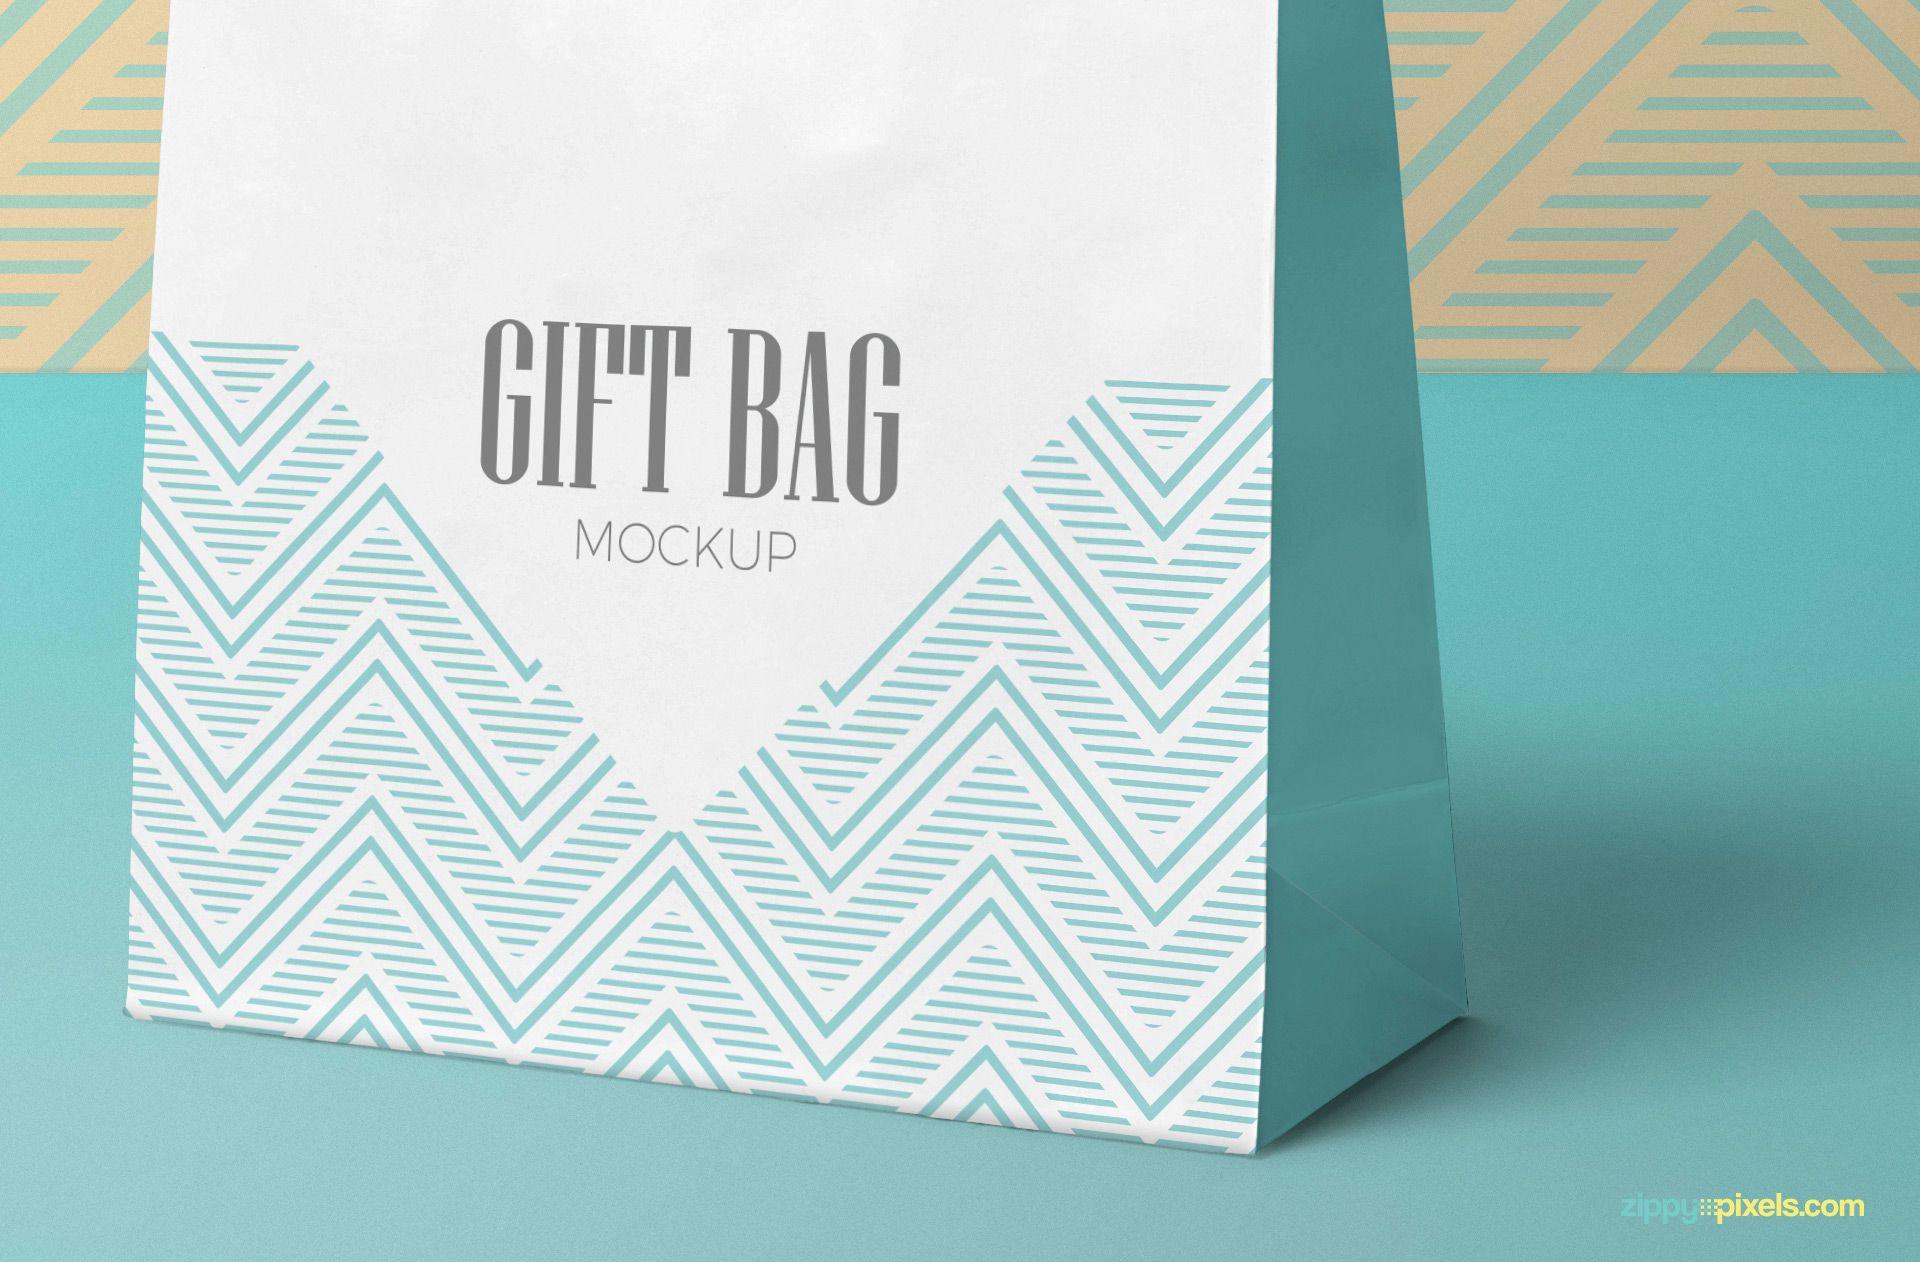 Download Free Attractive Gift Bag Mockup Zippypixels Bag Mockup Attractive Gift Psd Templates